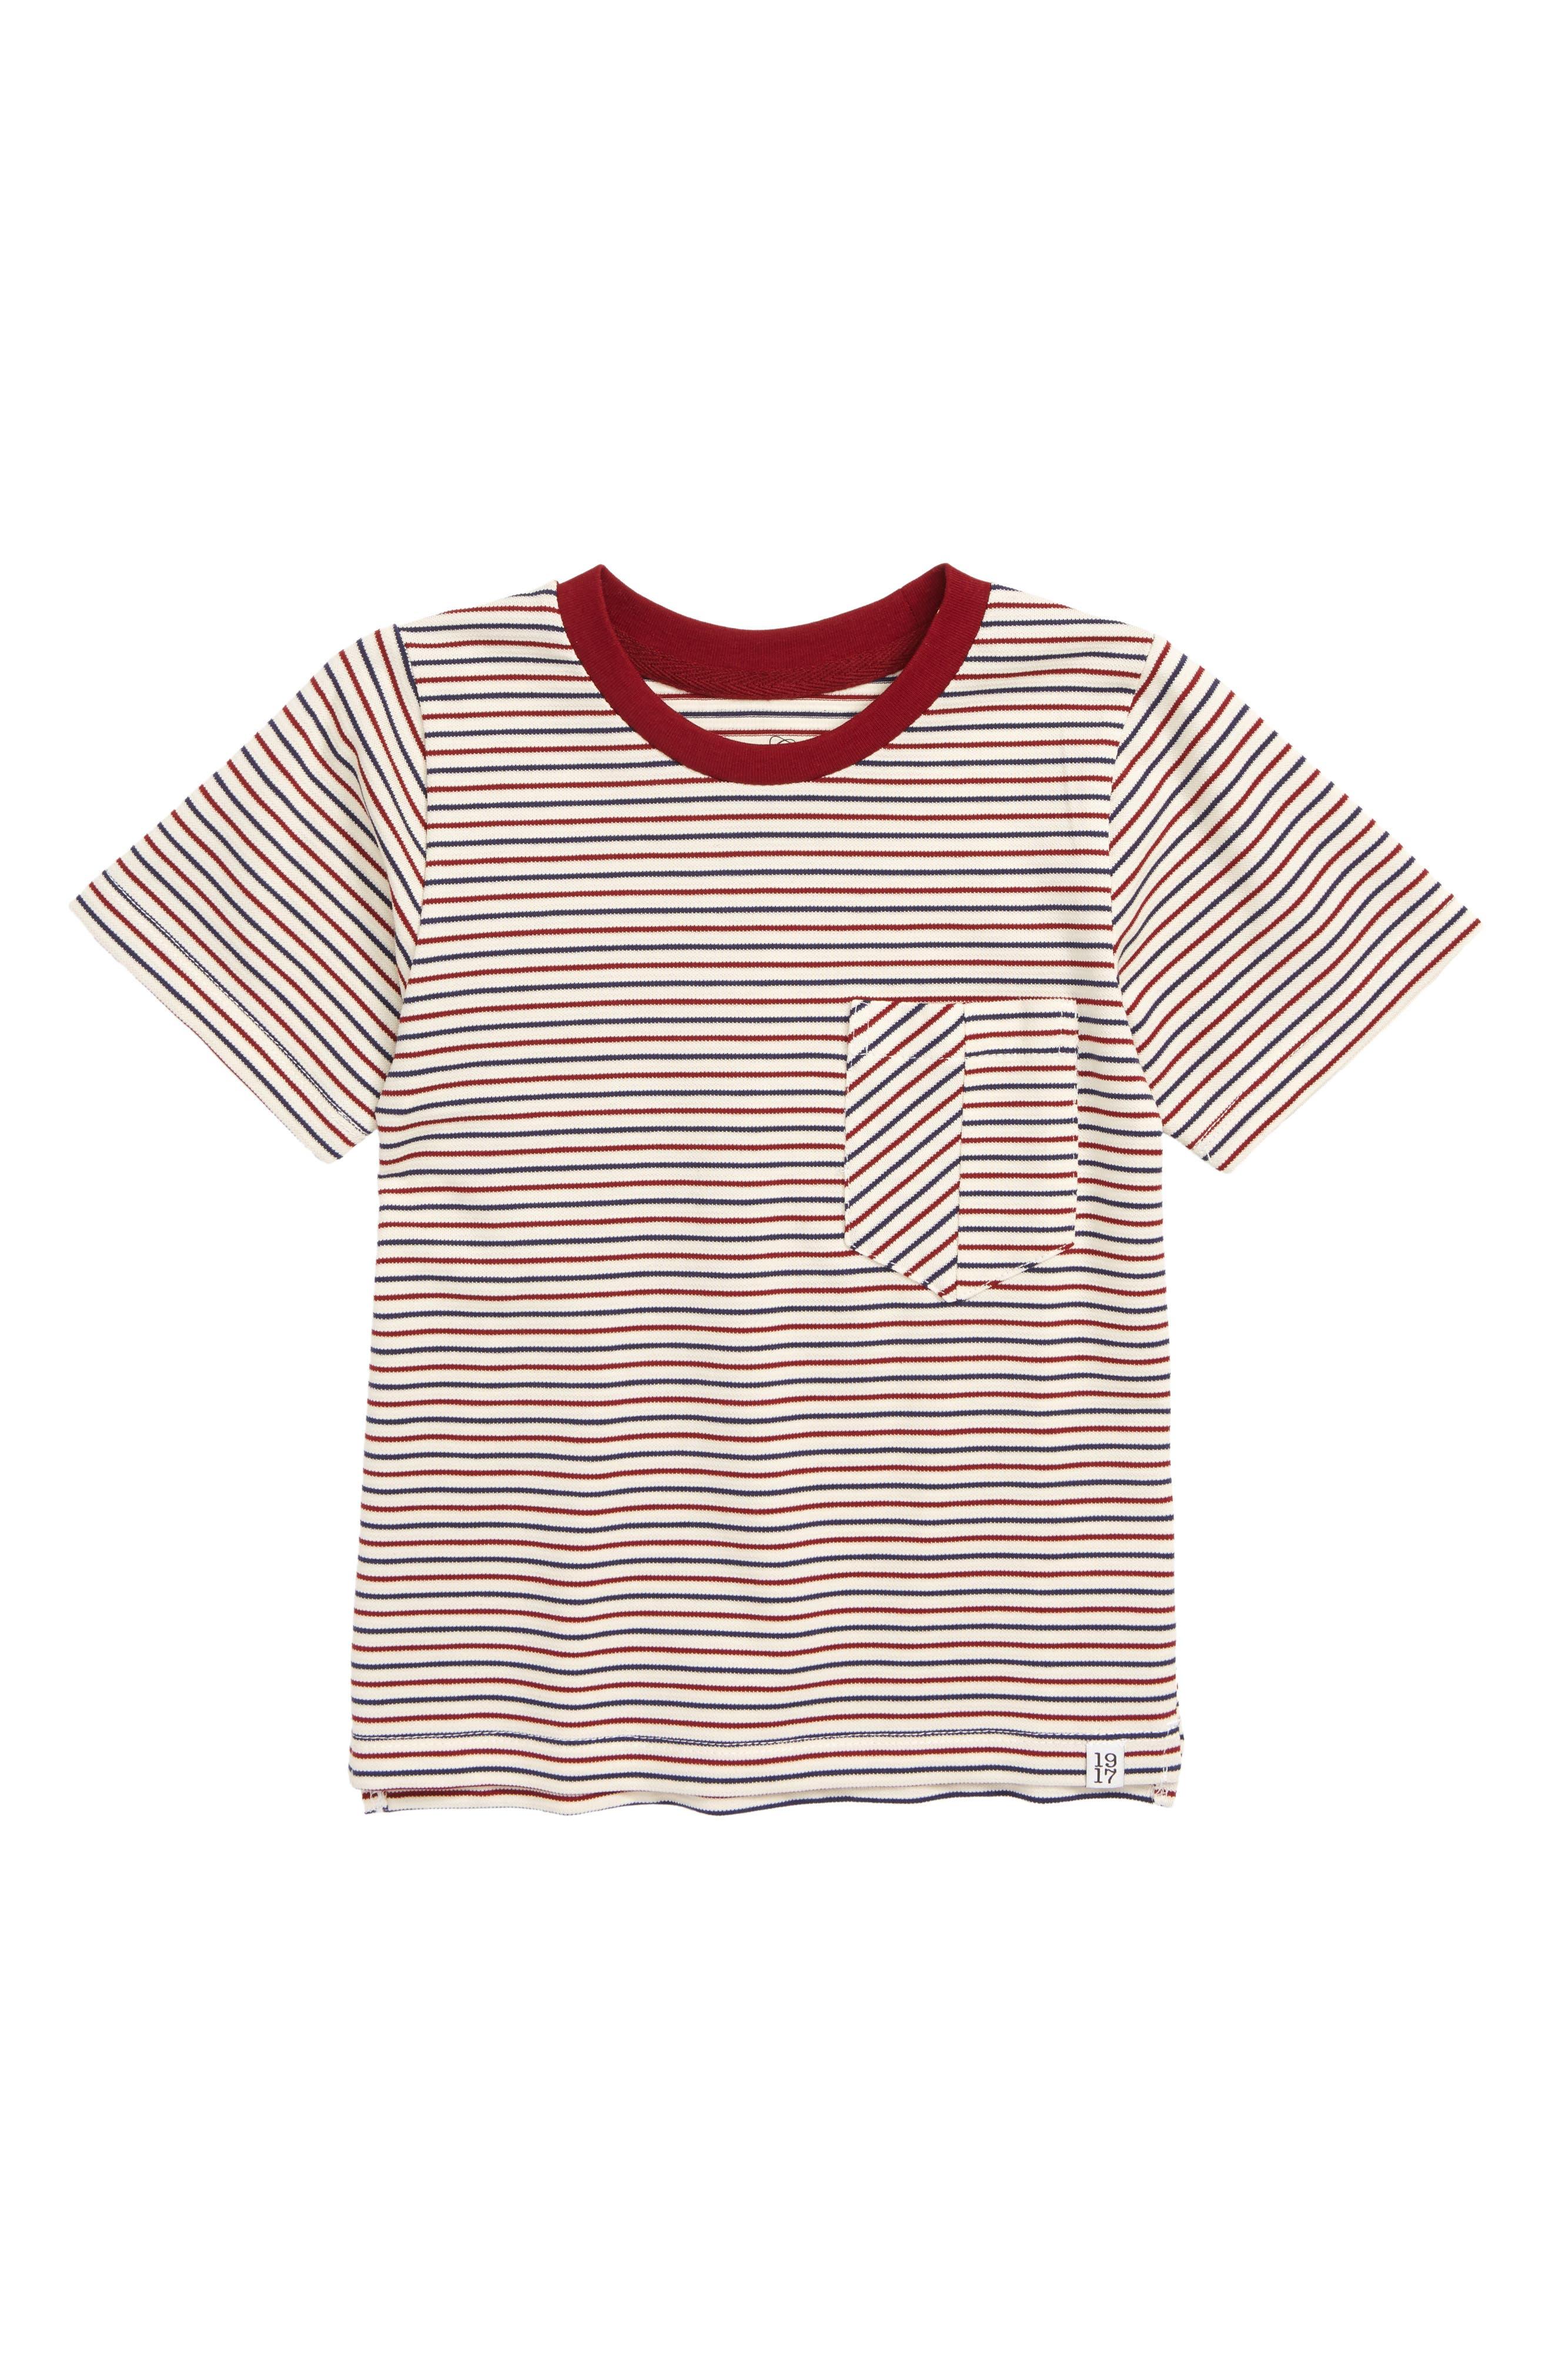 SOVEREIGN CODE,                             Castle Stripe Pocket T-Shirt,                             Main thumbnail 1, color,                             640